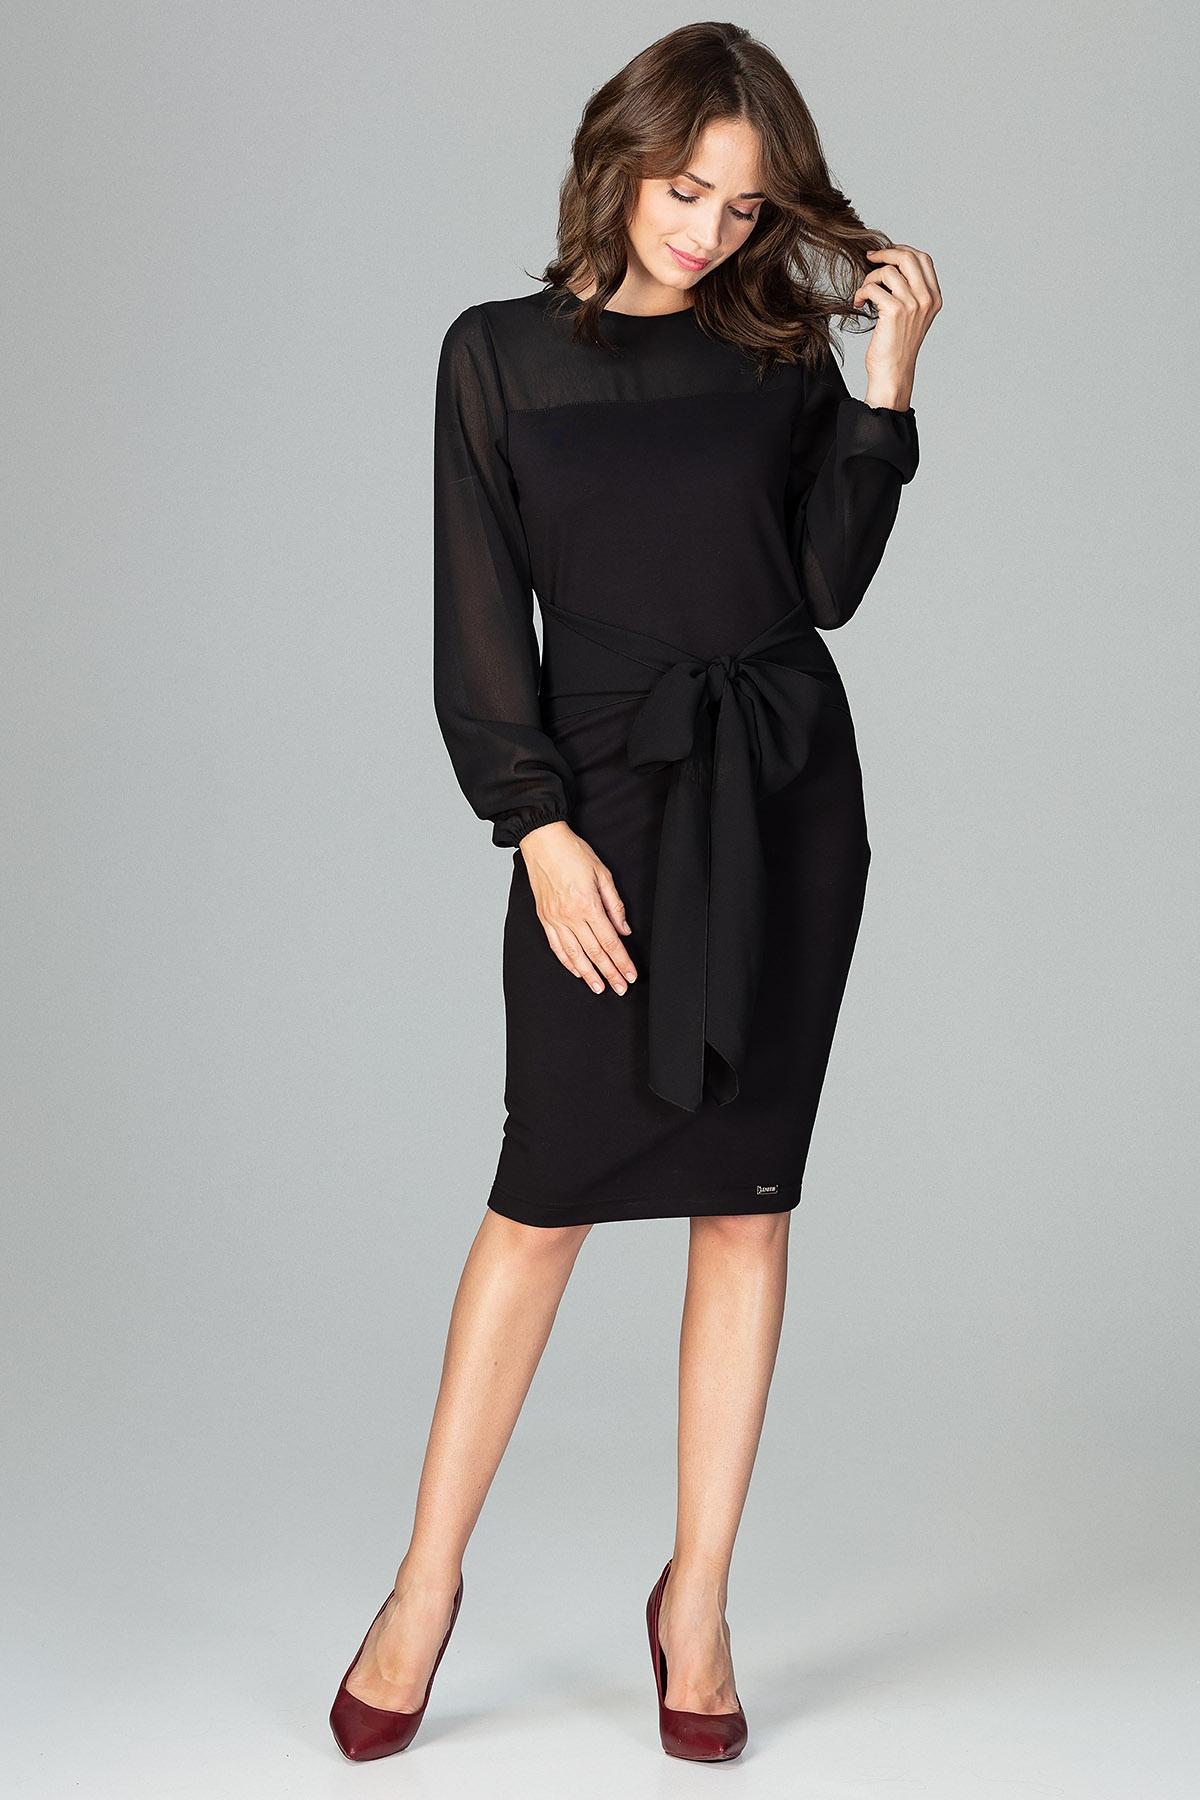 lenitif abendkleid mit femininer schleife Elegantes Abendkleid der Marke LENITIF AKLBB833260516